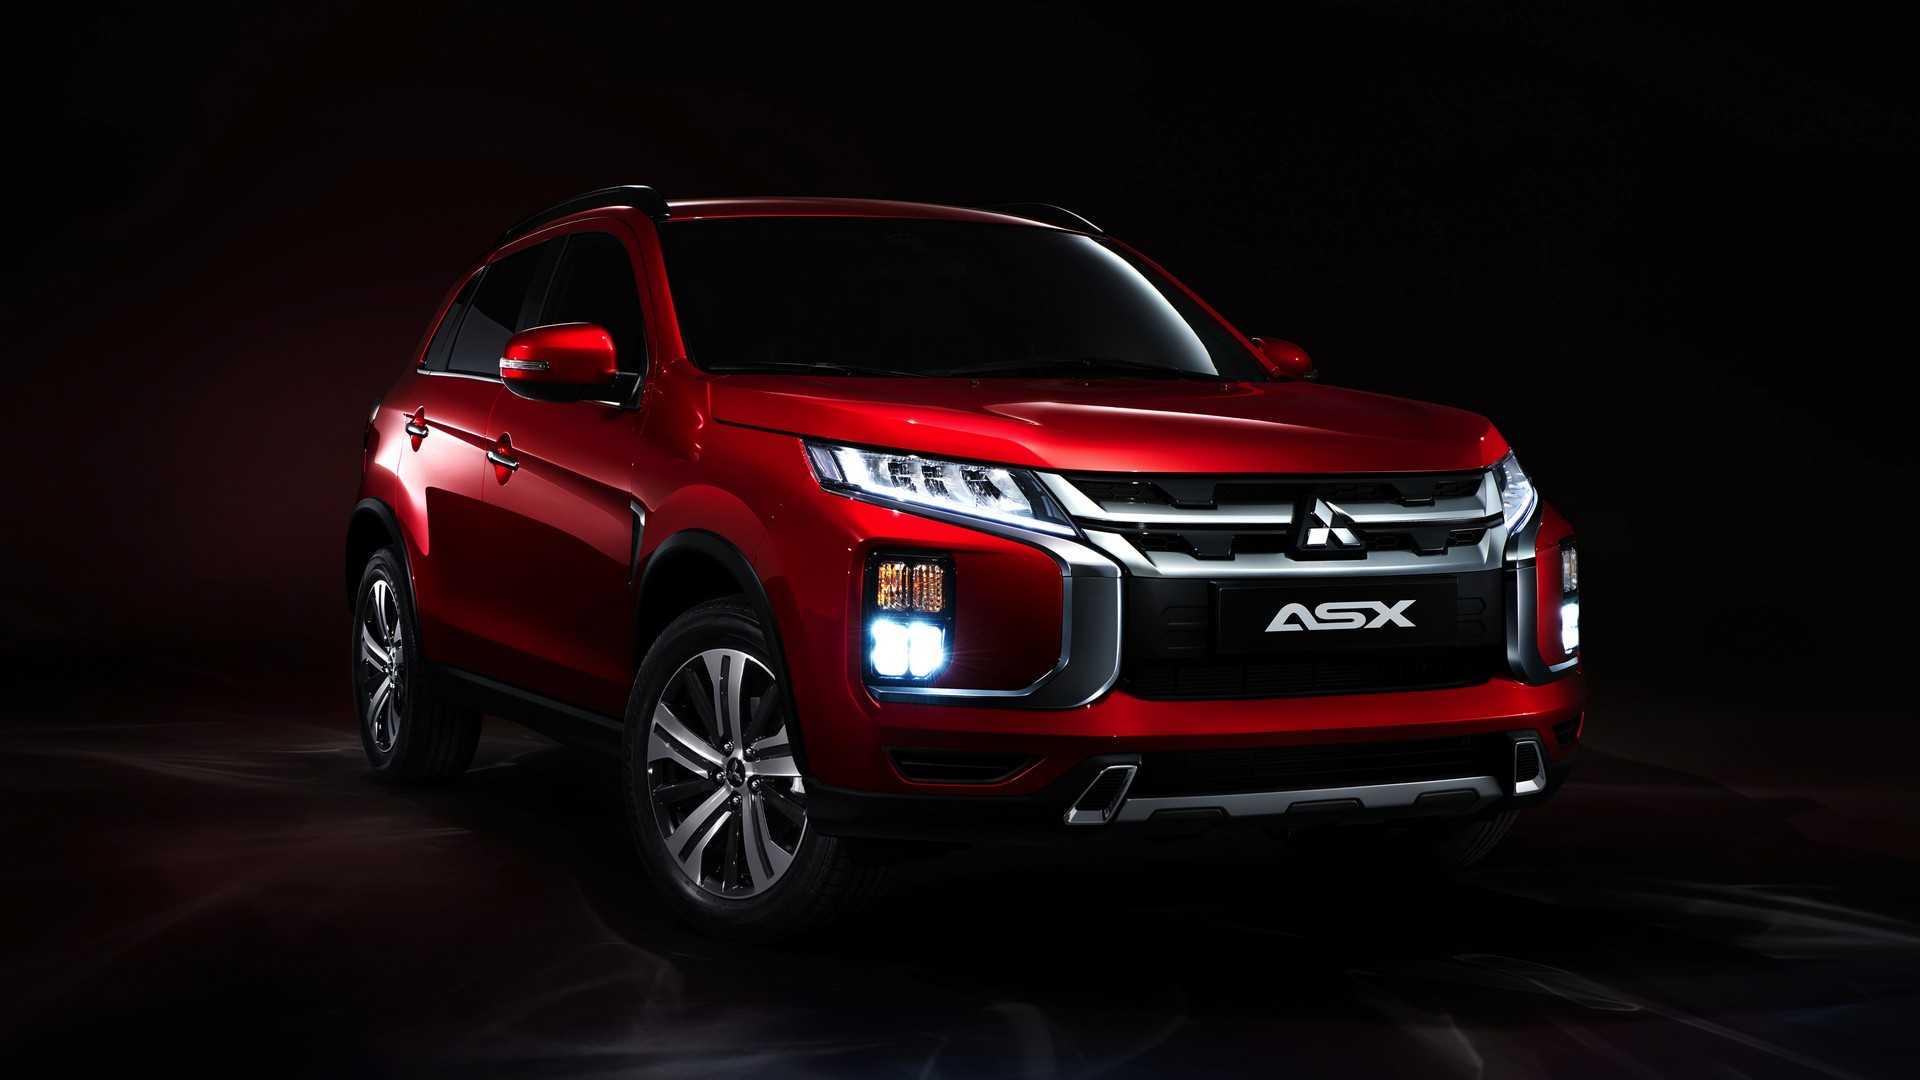 60 New Mitsubishi Asx 2020 Dimensions New Concept with Mitsubishi Asx 2020 Dimensions